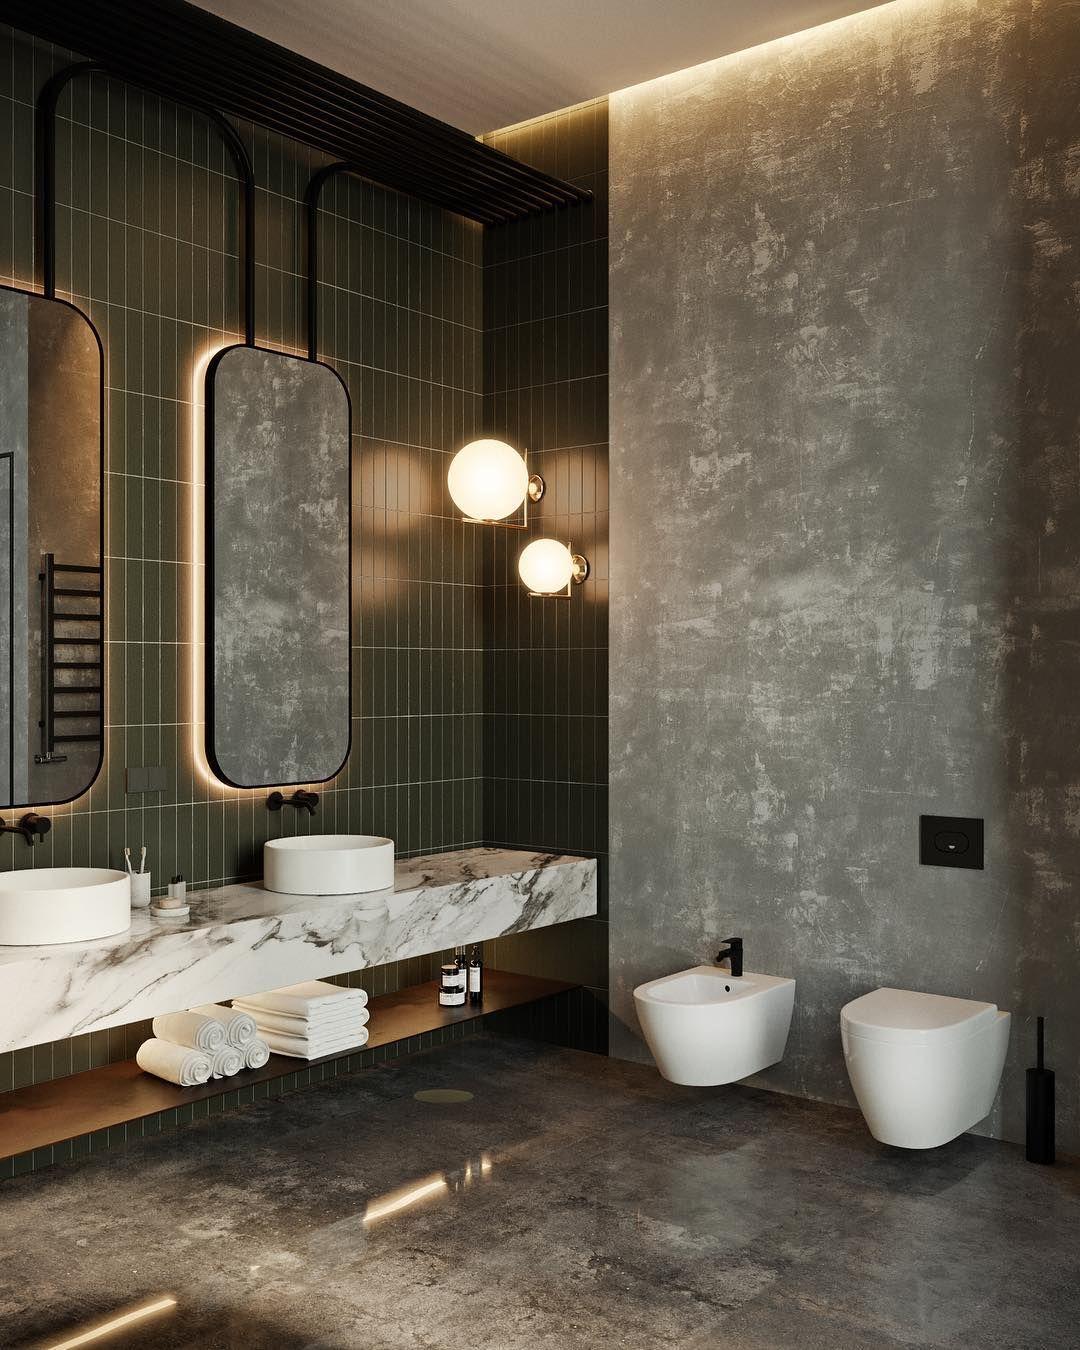 Michael Murphy Michaelmurphydesign Instagram Photos And Videos Industrial Bathroom Design Marble Bathroom Designs Bathroom Design Inspiration